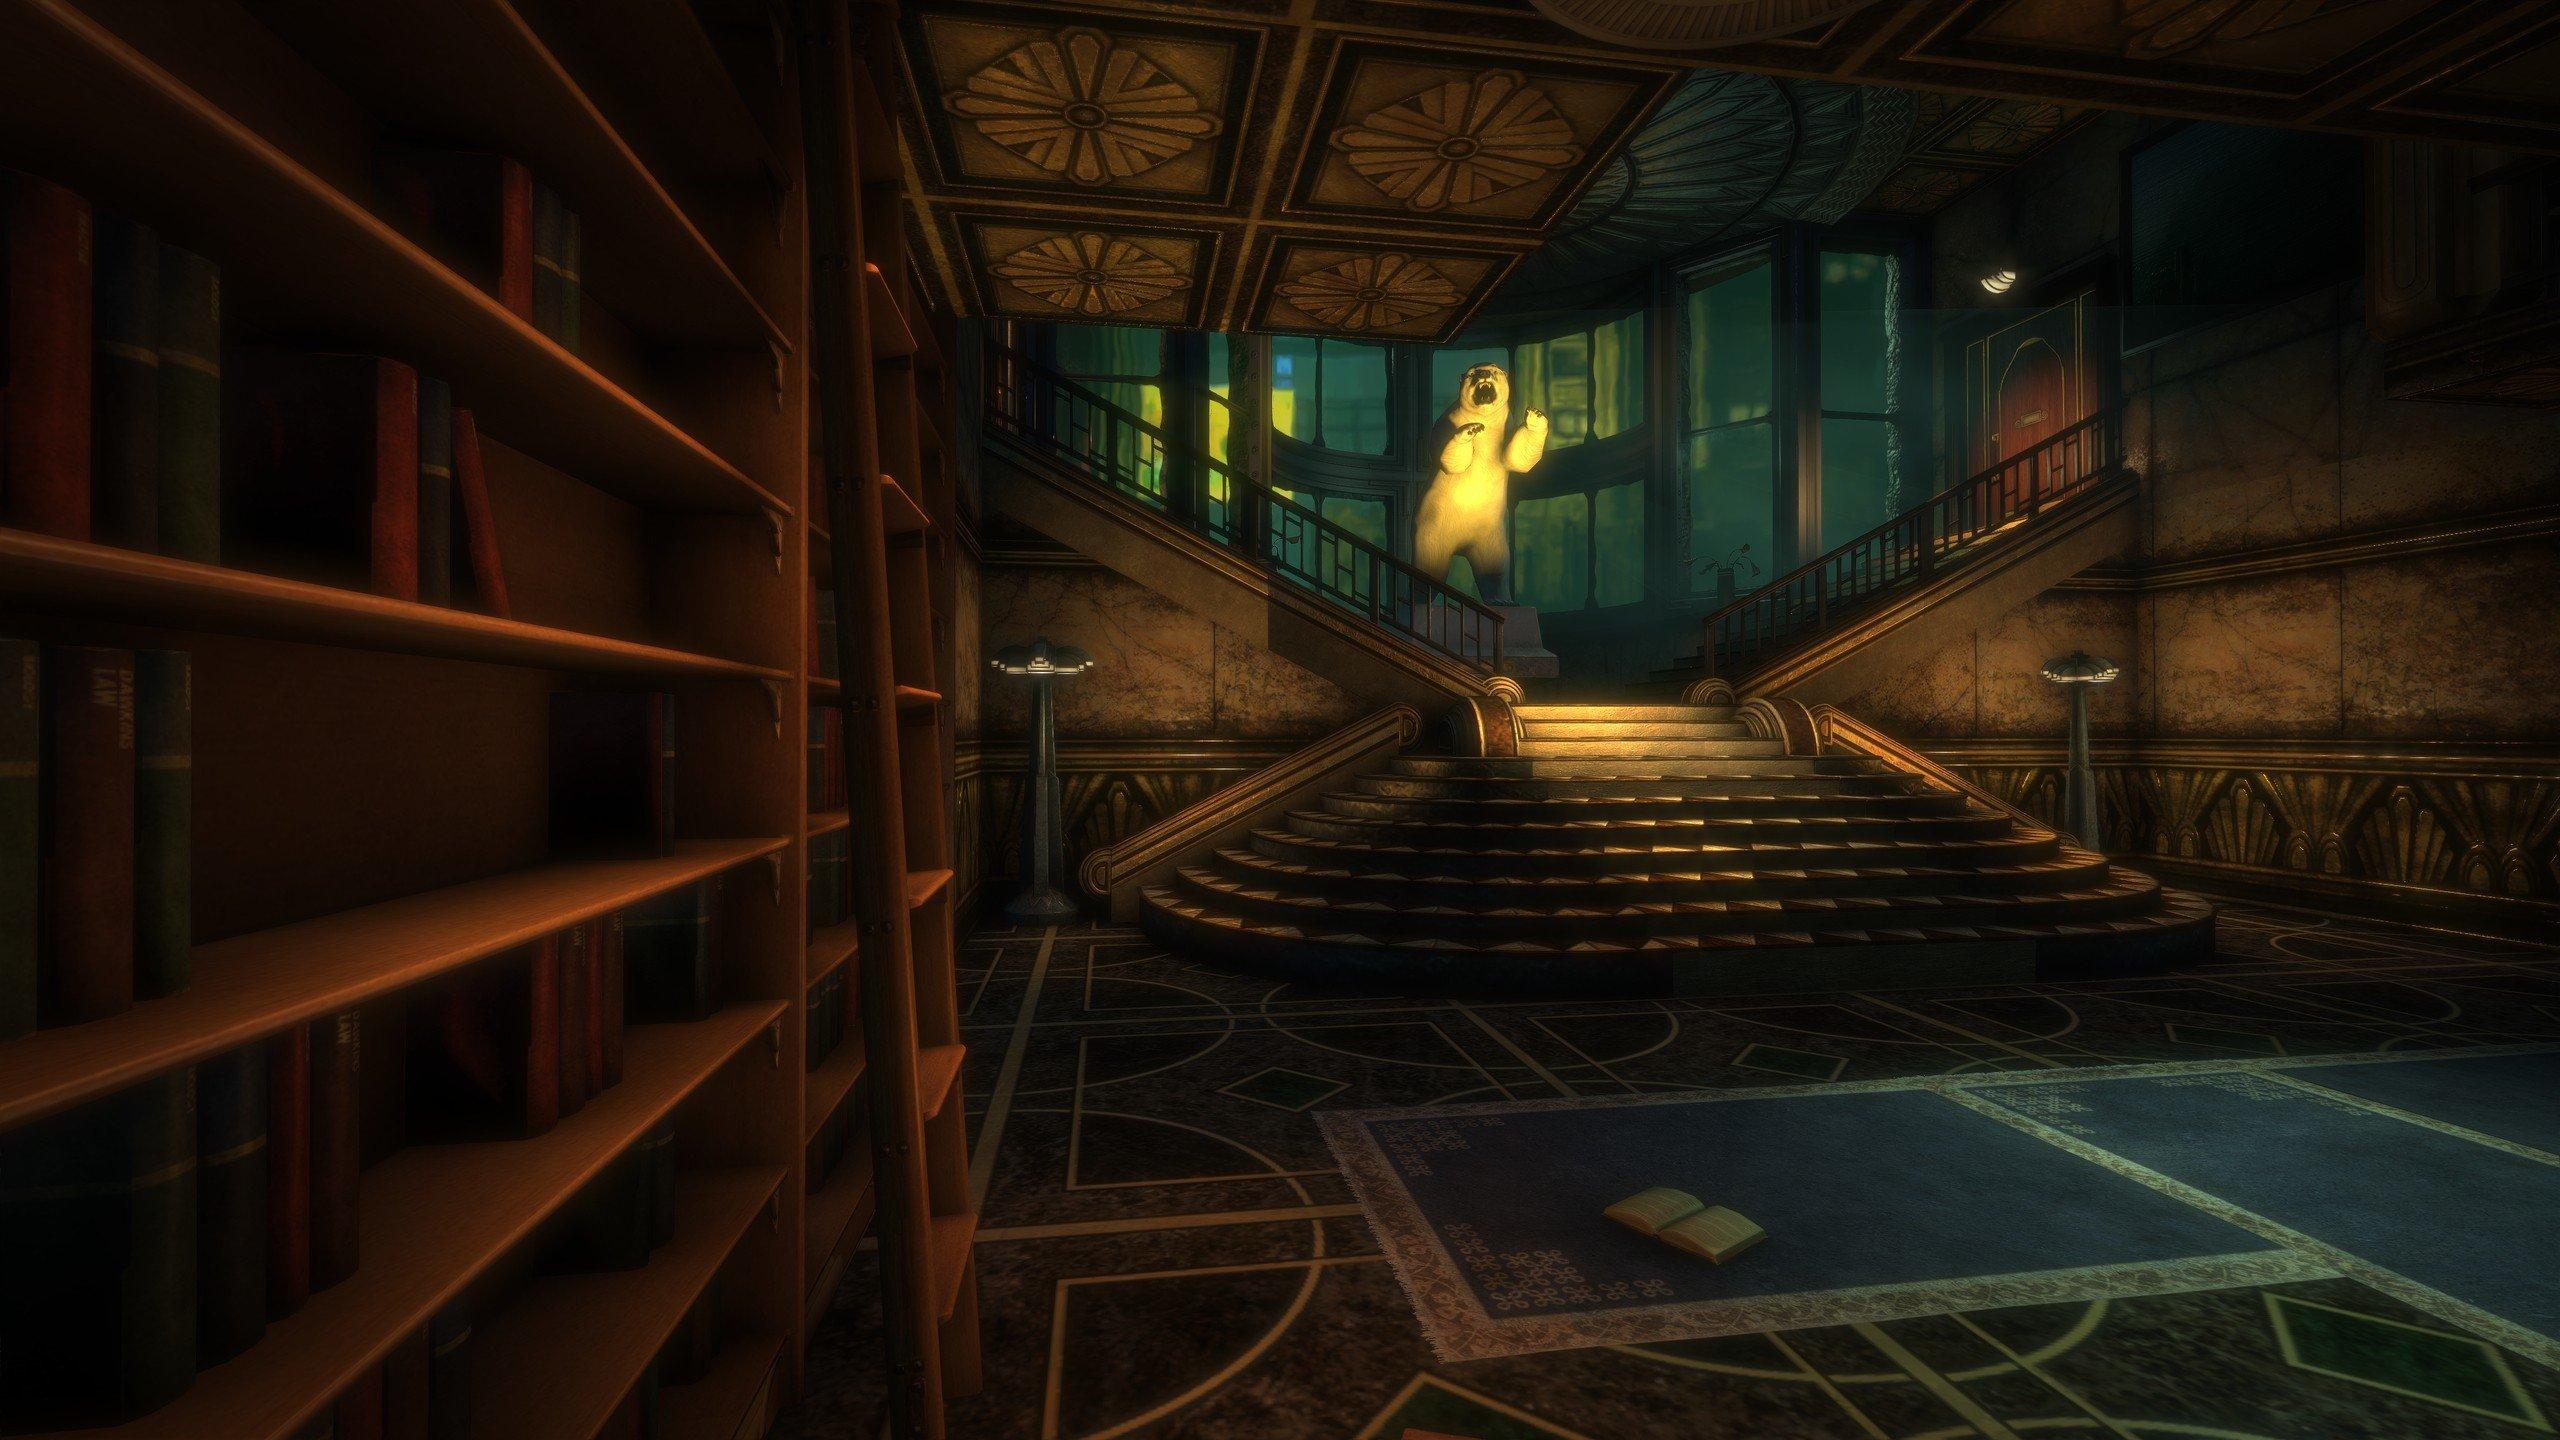 Rapture BioShock Wallpapers Group